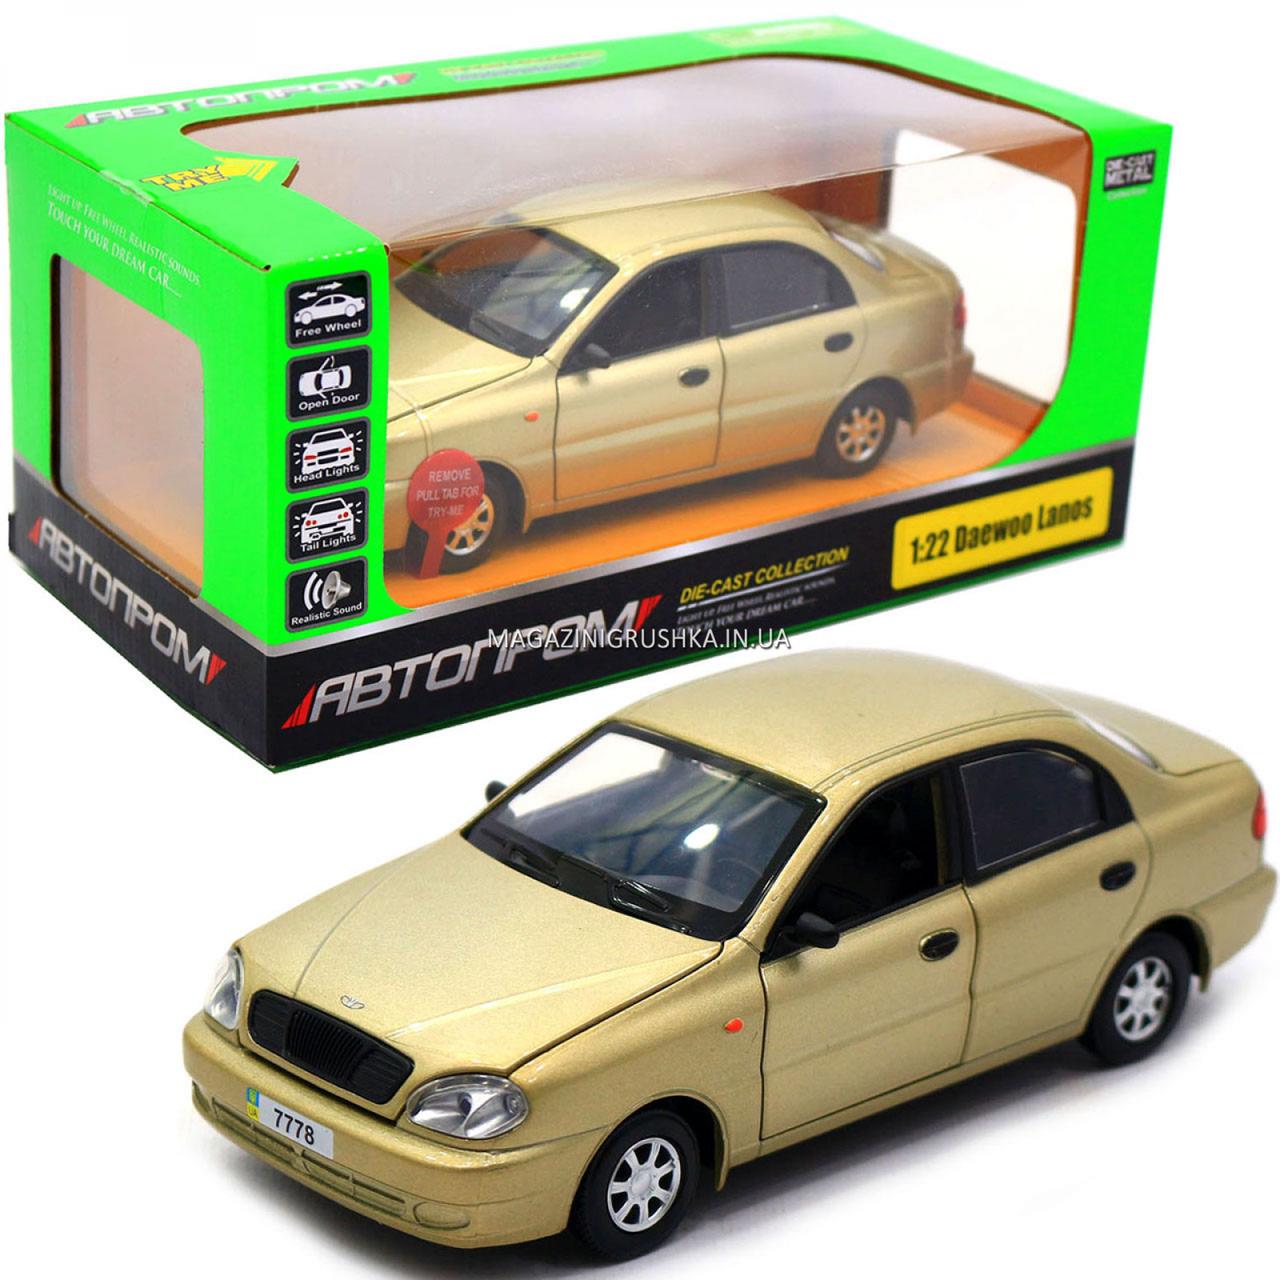 Машинка ігрова автопром «Ланос» Бронза (світло, звук) 7778